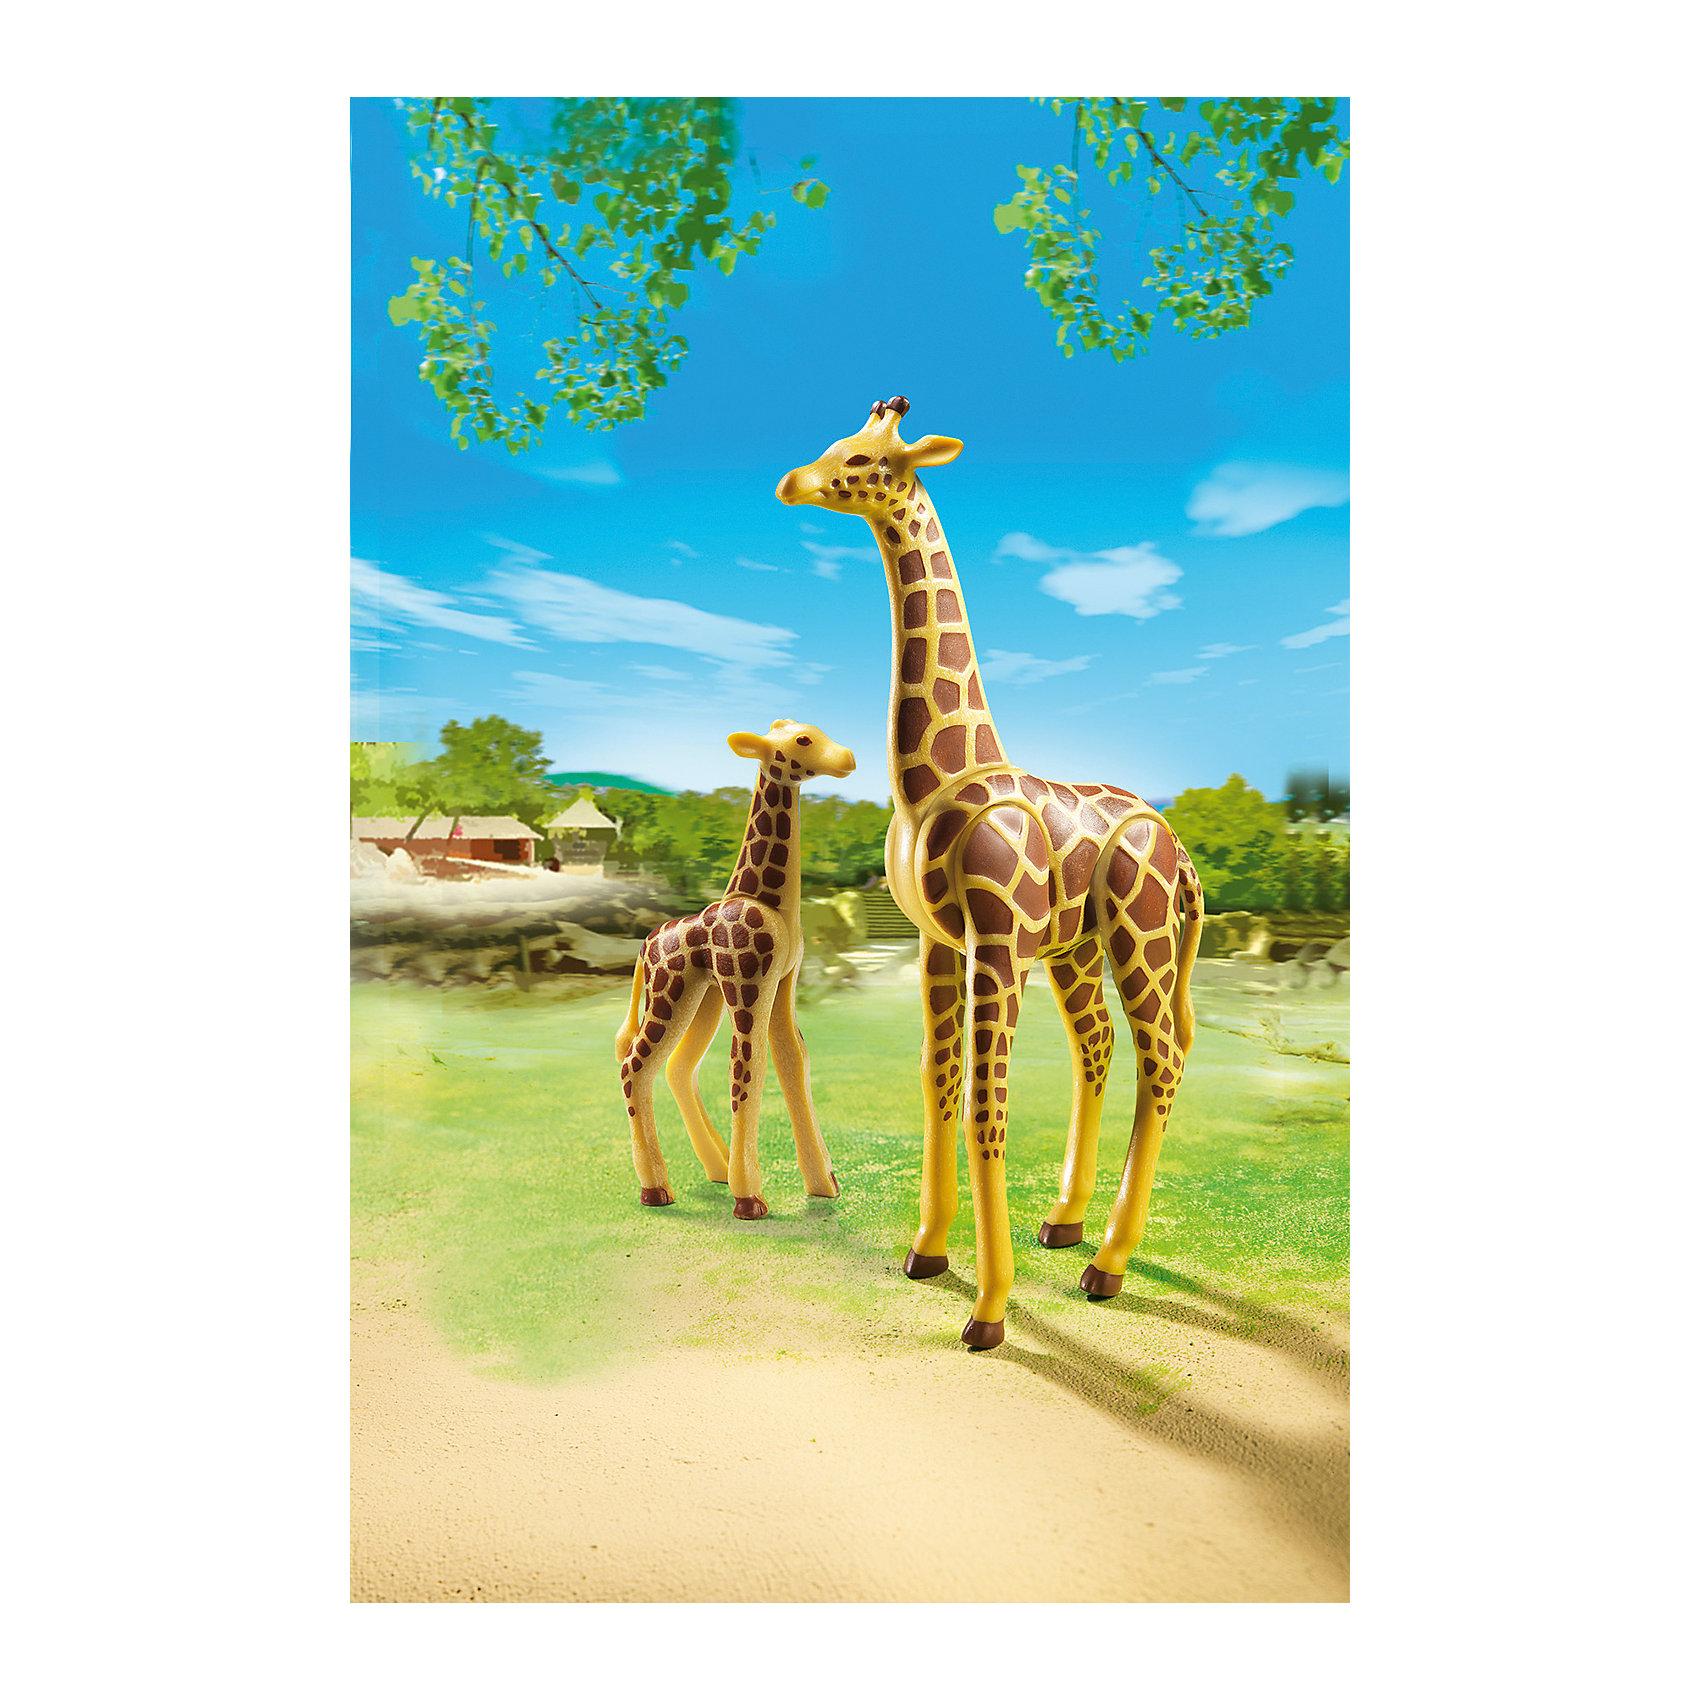 PLAYMOBIL® Зоопарк: Жираф со своим детенышем жирафом, PLAYMOBIL playmobil® зоопарк семья зебр playmobil